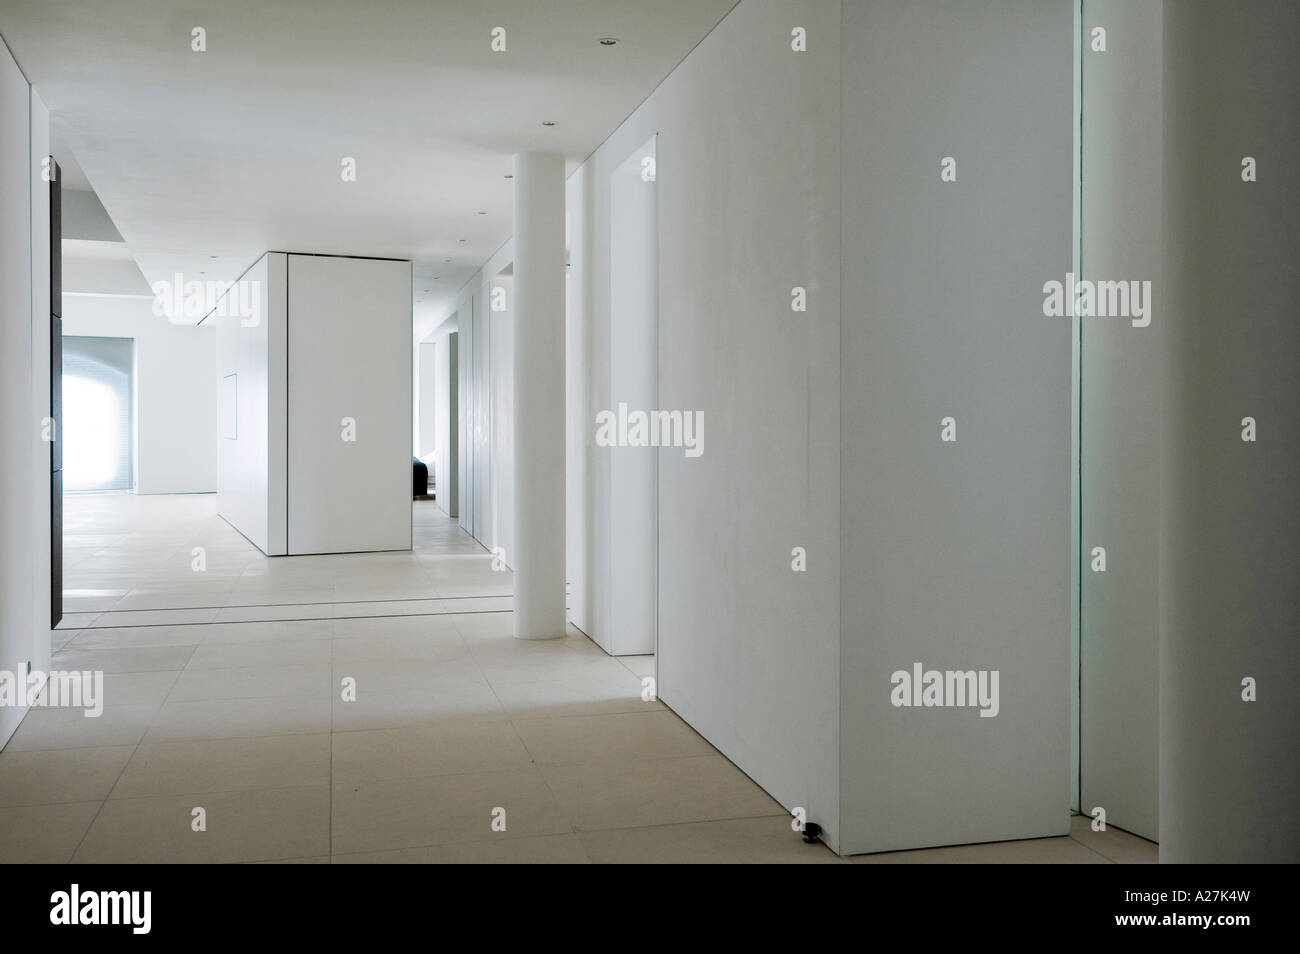 Minimalist hallway stockfotos & minimalist hallway bilder alamy